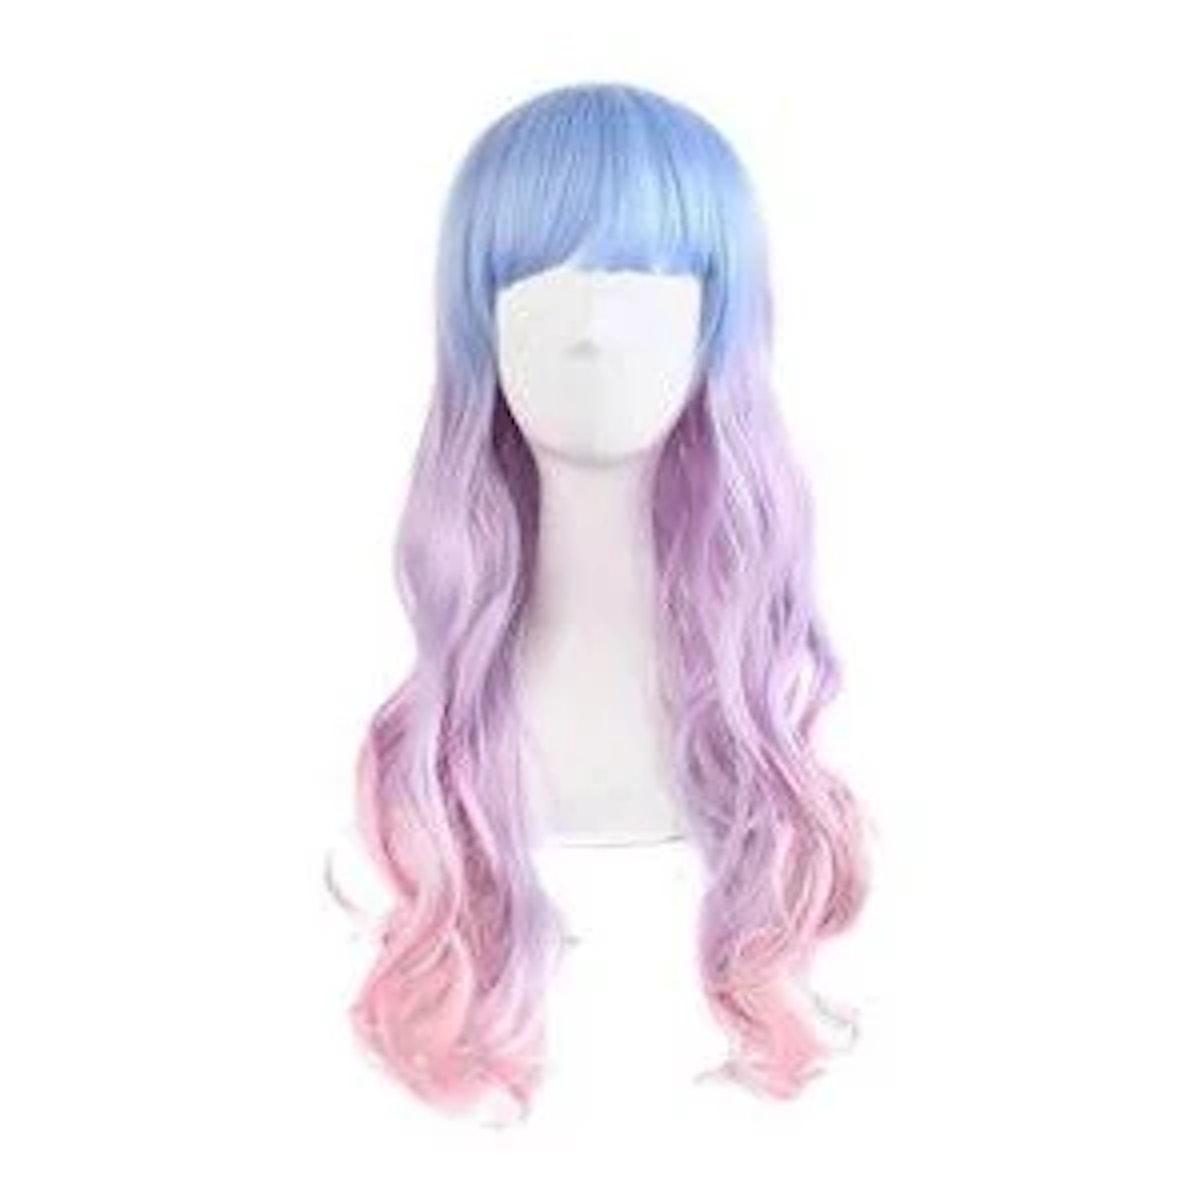 "Multi-Color Wavy Mermaid Party Halloween Wig 26"" (Light Blue, Pink, Purple)"